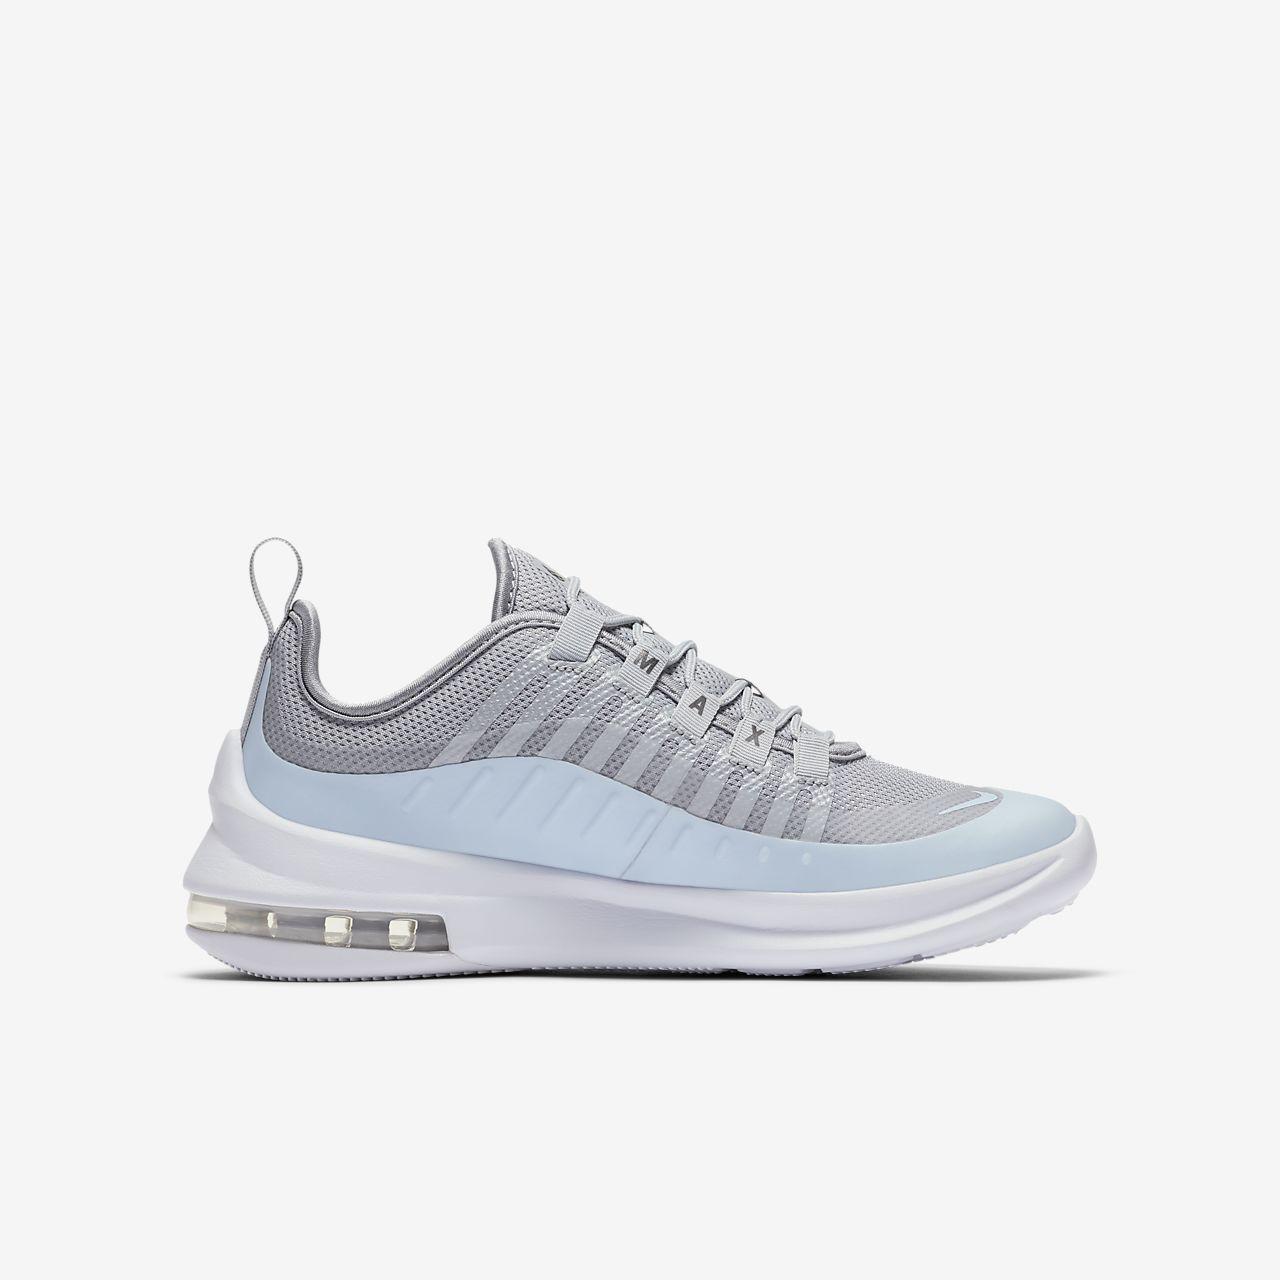 Buty dla dużych dzieci Nike Air Max Axis EP Szary 295.00